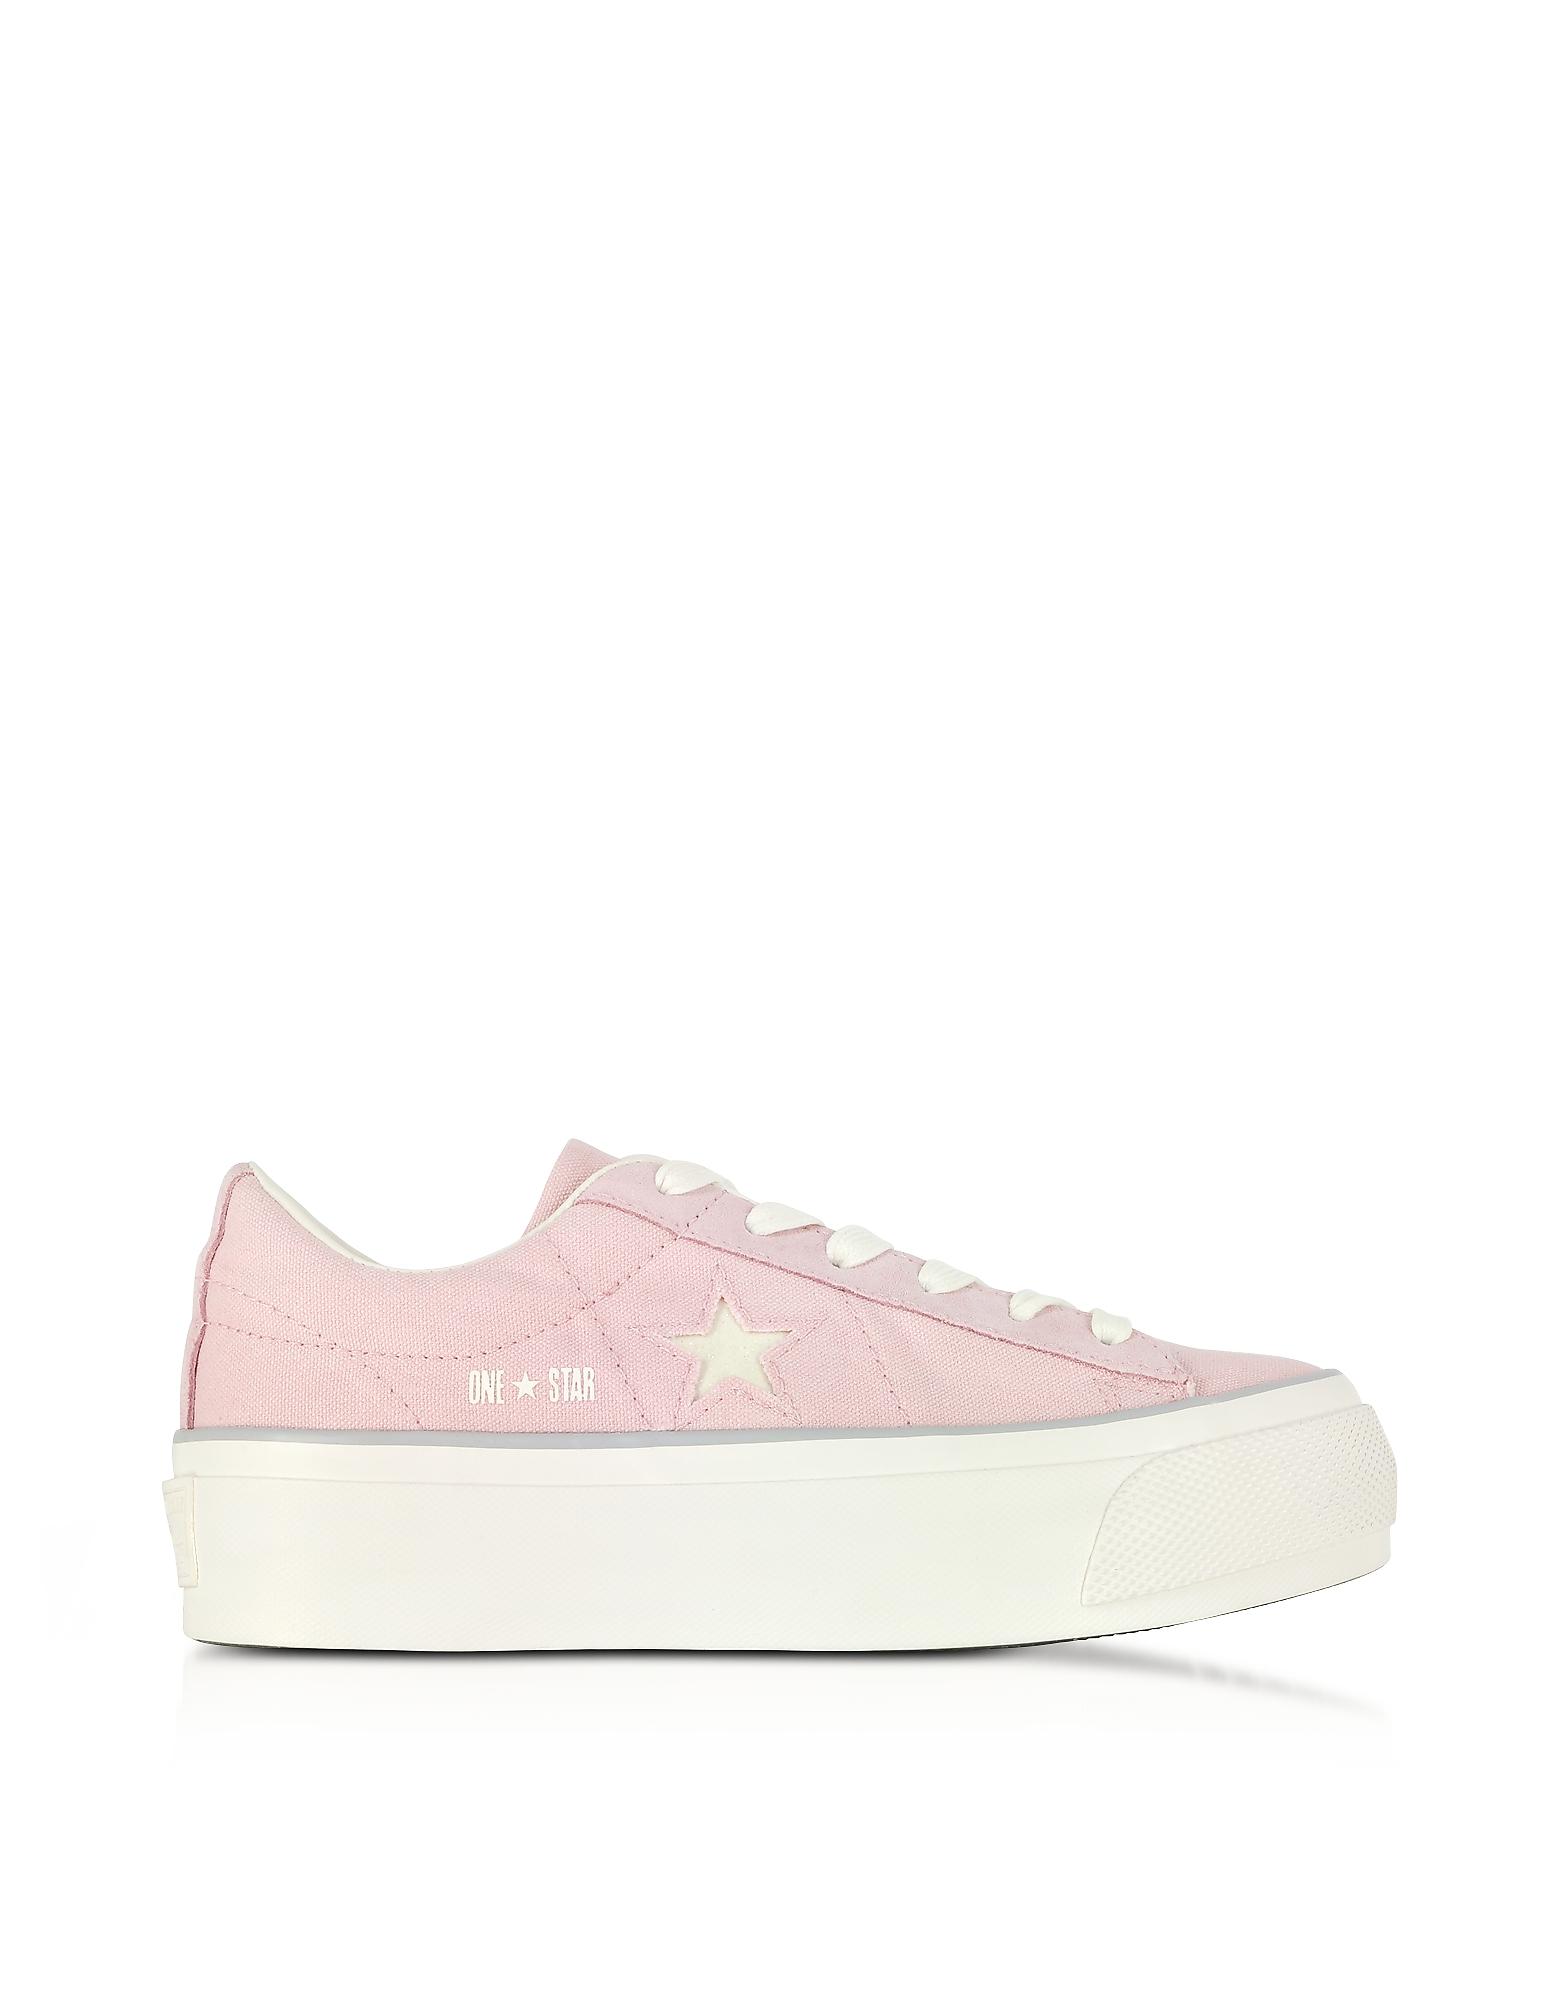 Une Star Ox Peau de Pêche Canvas Flatform Sneakers w/White Glitter Star